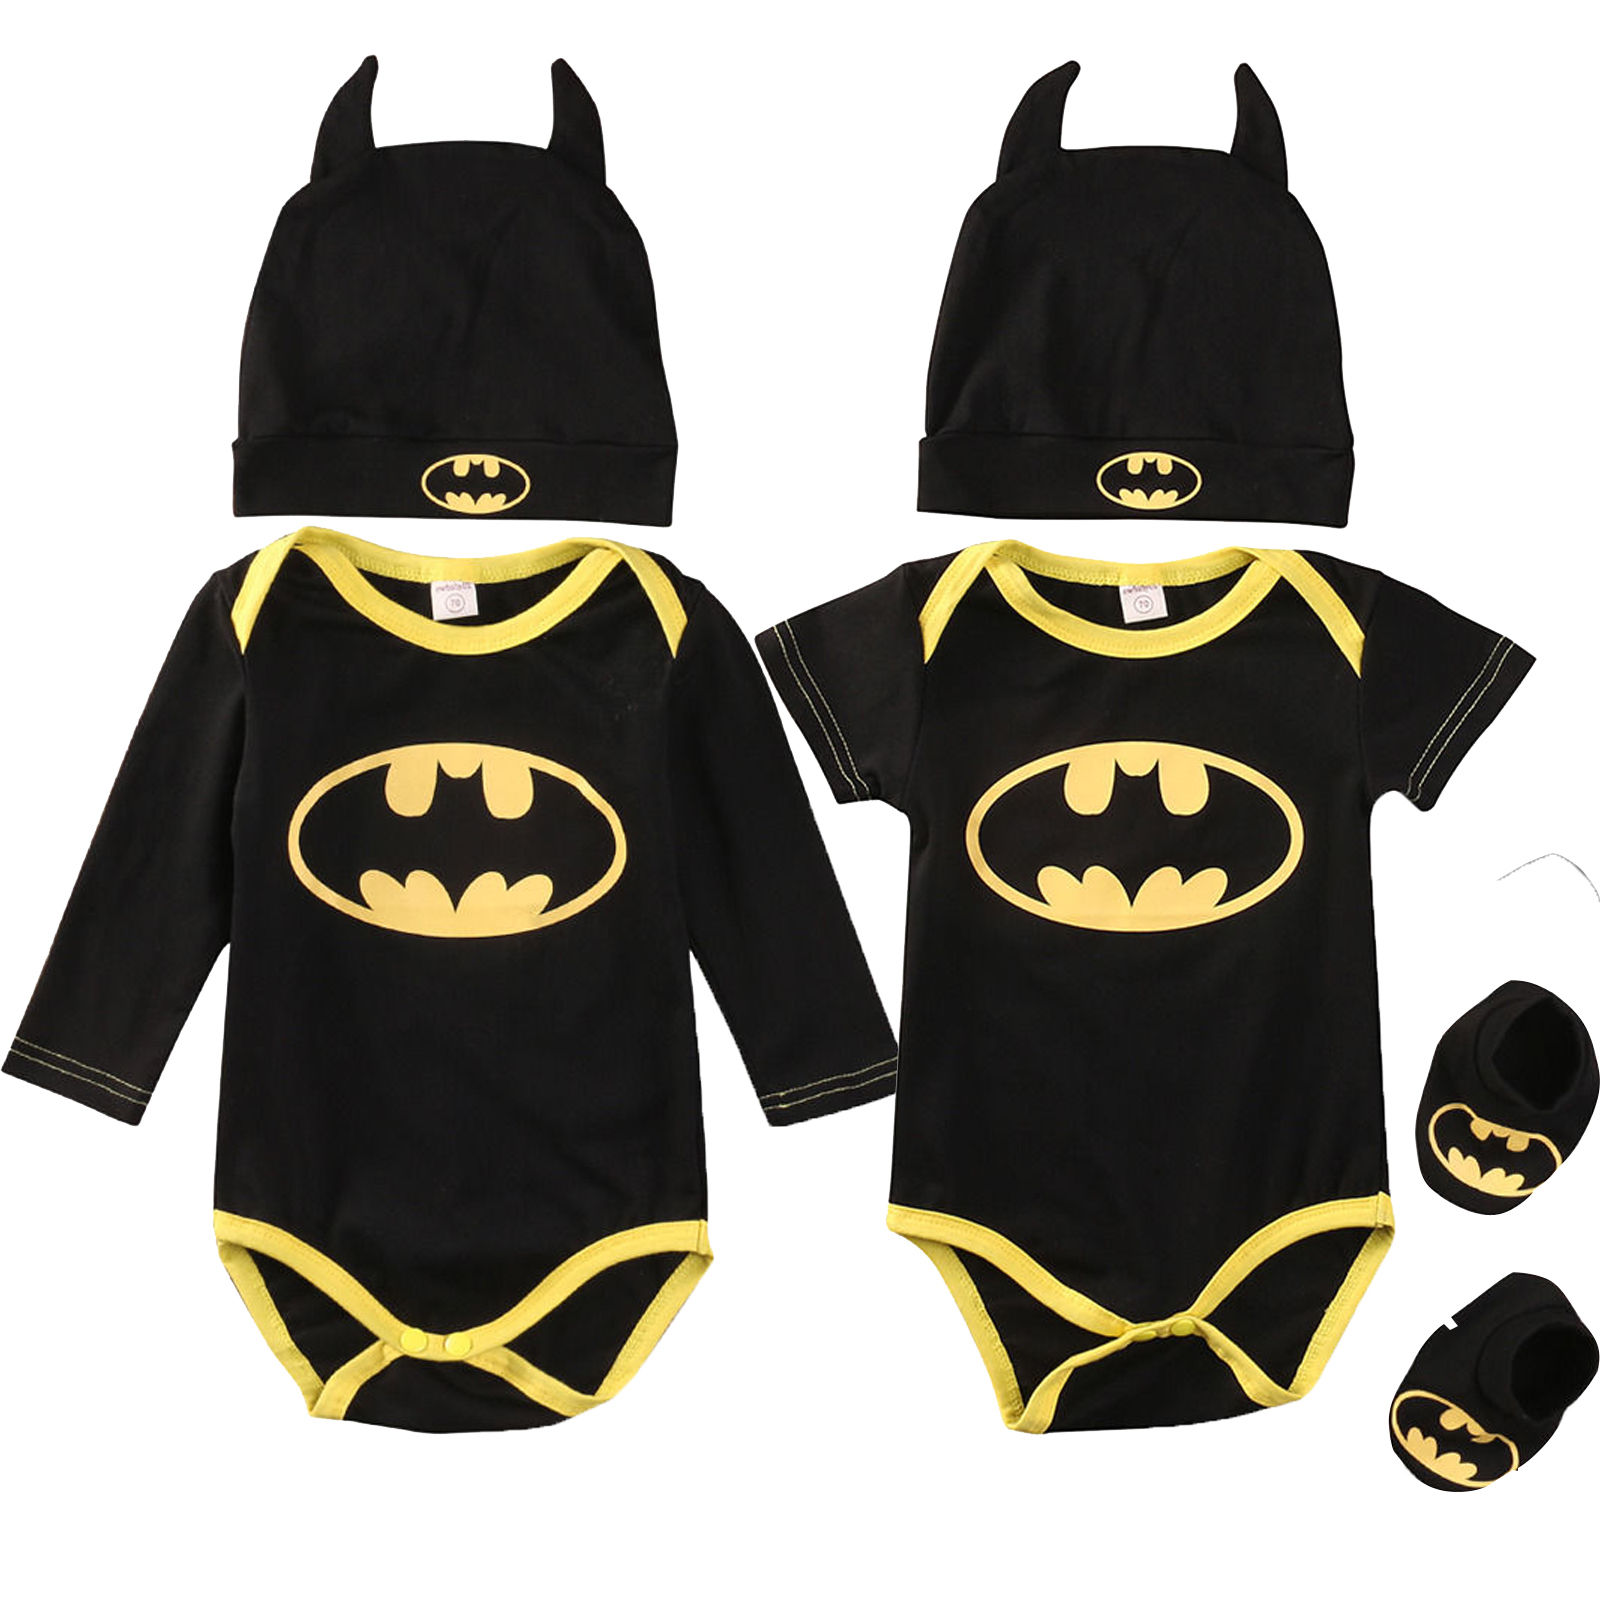 Batman Rompers Bodysuit Shoes Hat Costumes 3Pcs Jumpsuits Halloween Newborn Baby Boy Girl Clothes Summer Autumn Outfits Sets